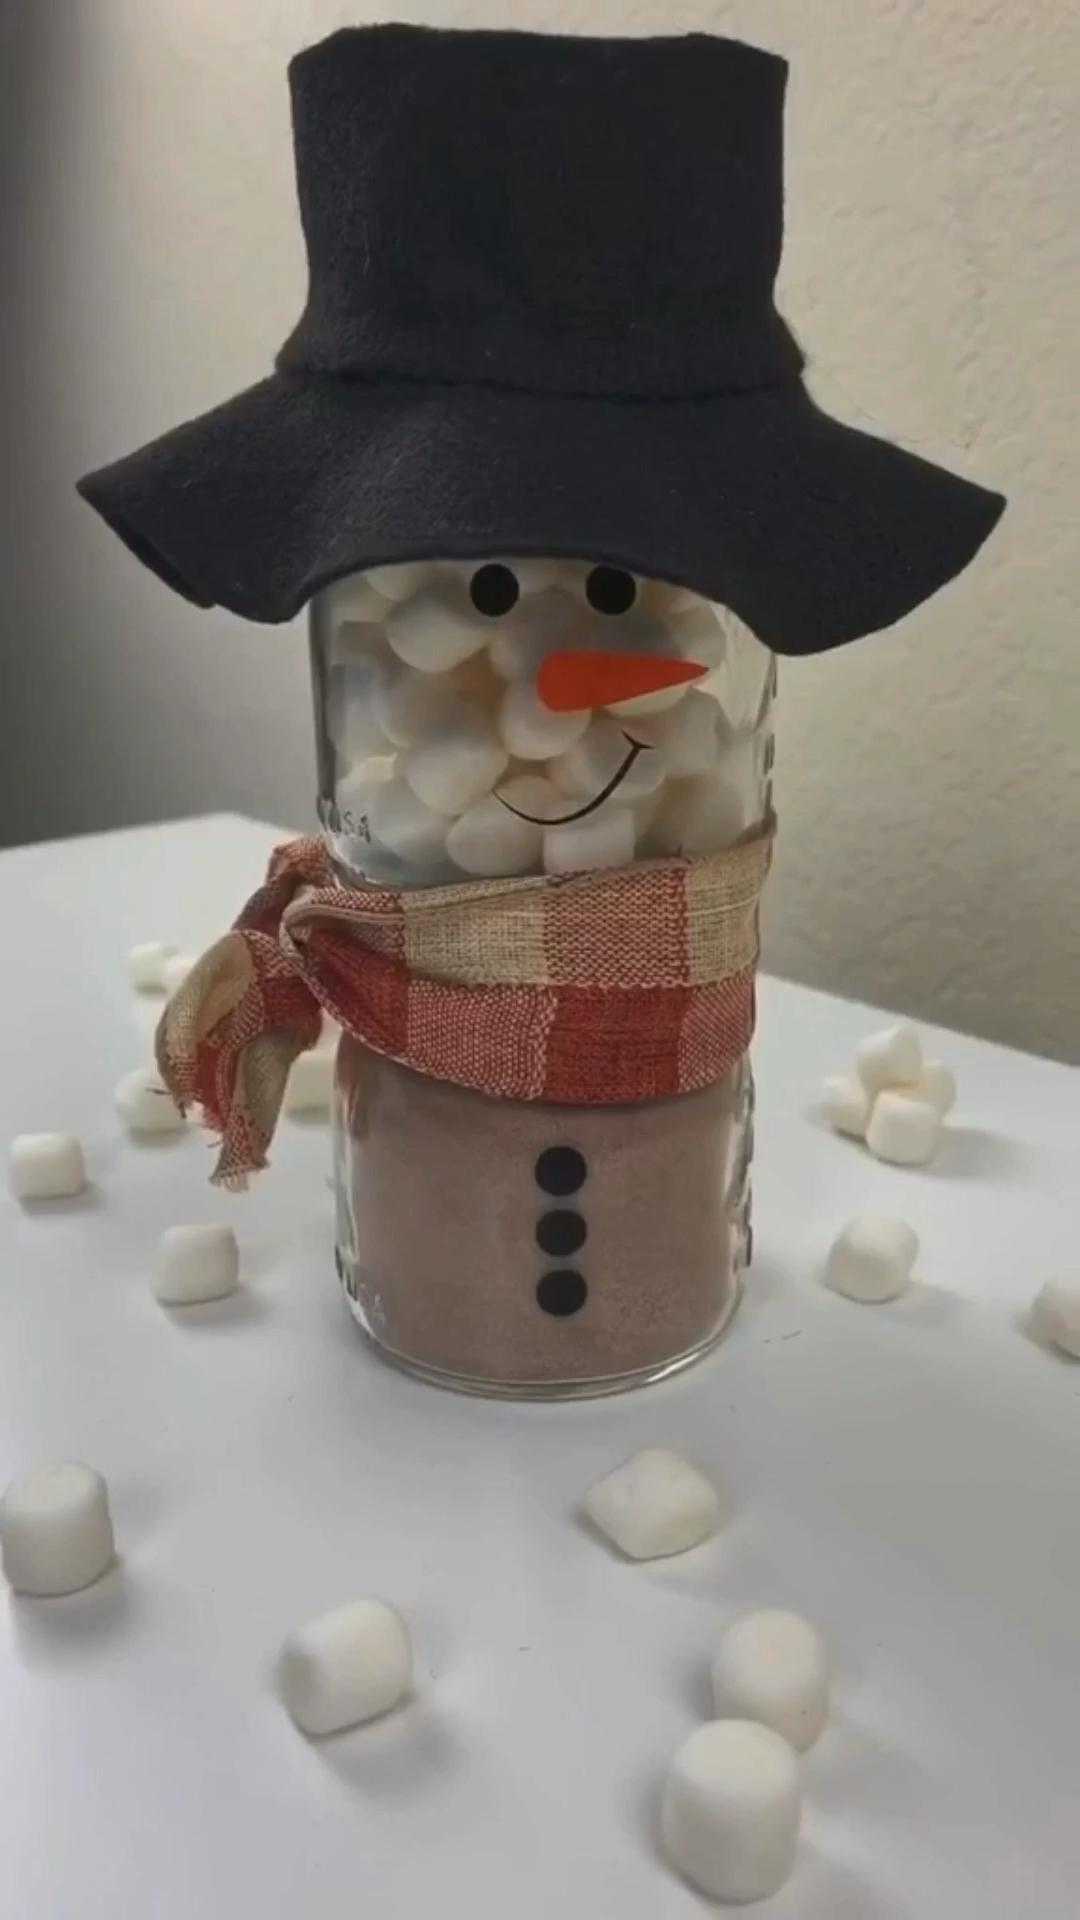 #diy #christmas #hotchocolaterecipes #christmasdecor #christmasgifts #gift #giftideas #christmasideas #snowman #snowmancrafts #holiday #holidaygift